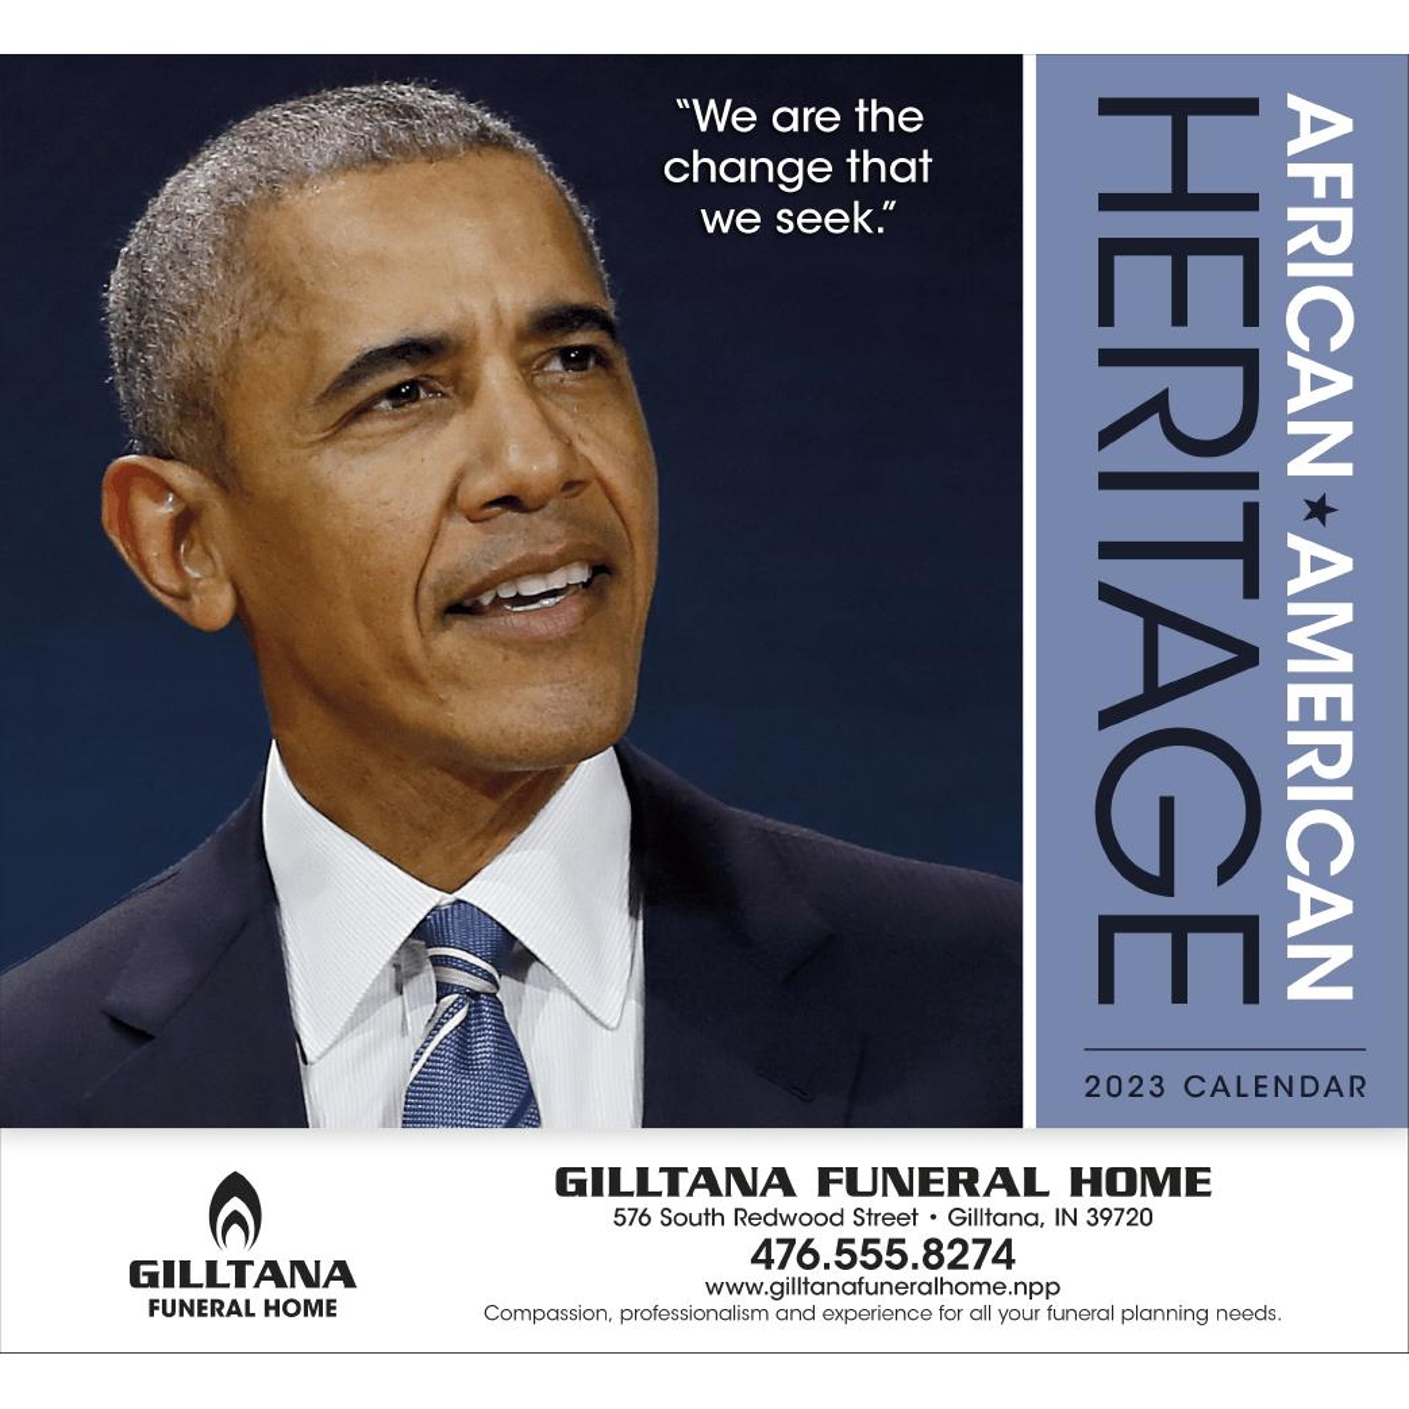 African-American Heritage (Barack Obama, 2016)